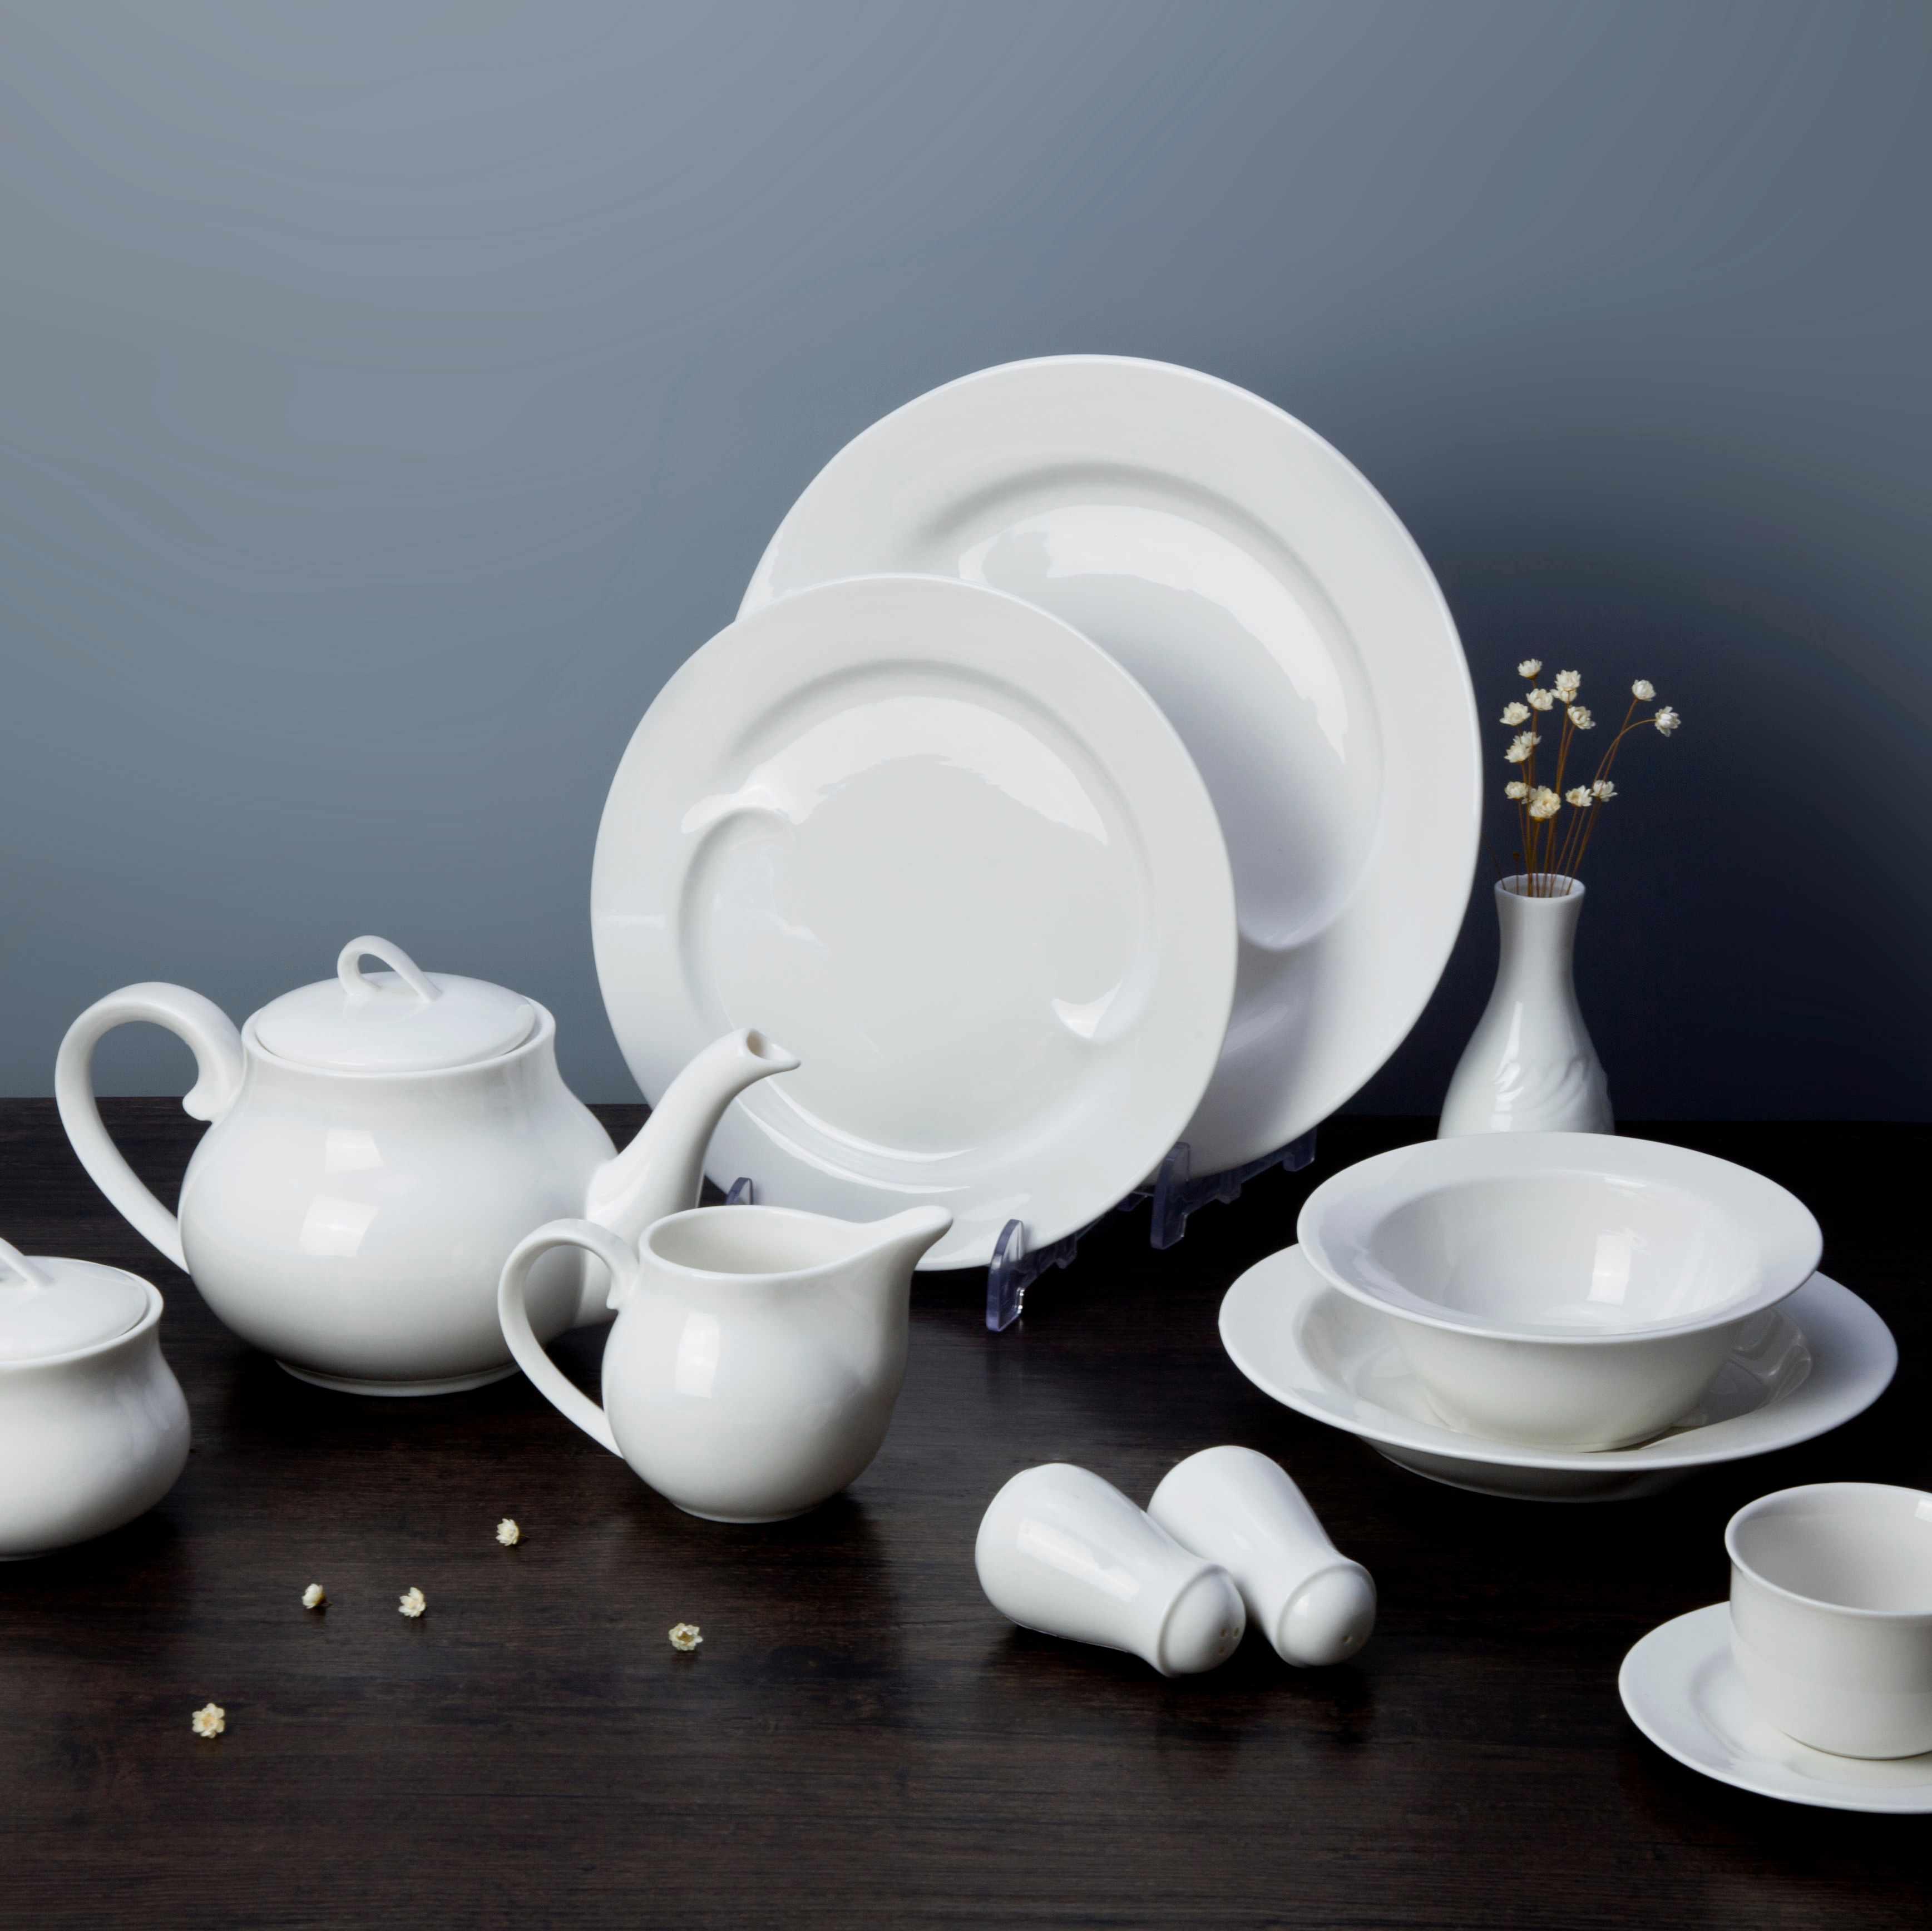 Two Eight White ceramic dinnerware set - TAO FU SERIES White Porcelain Dinner Set image7